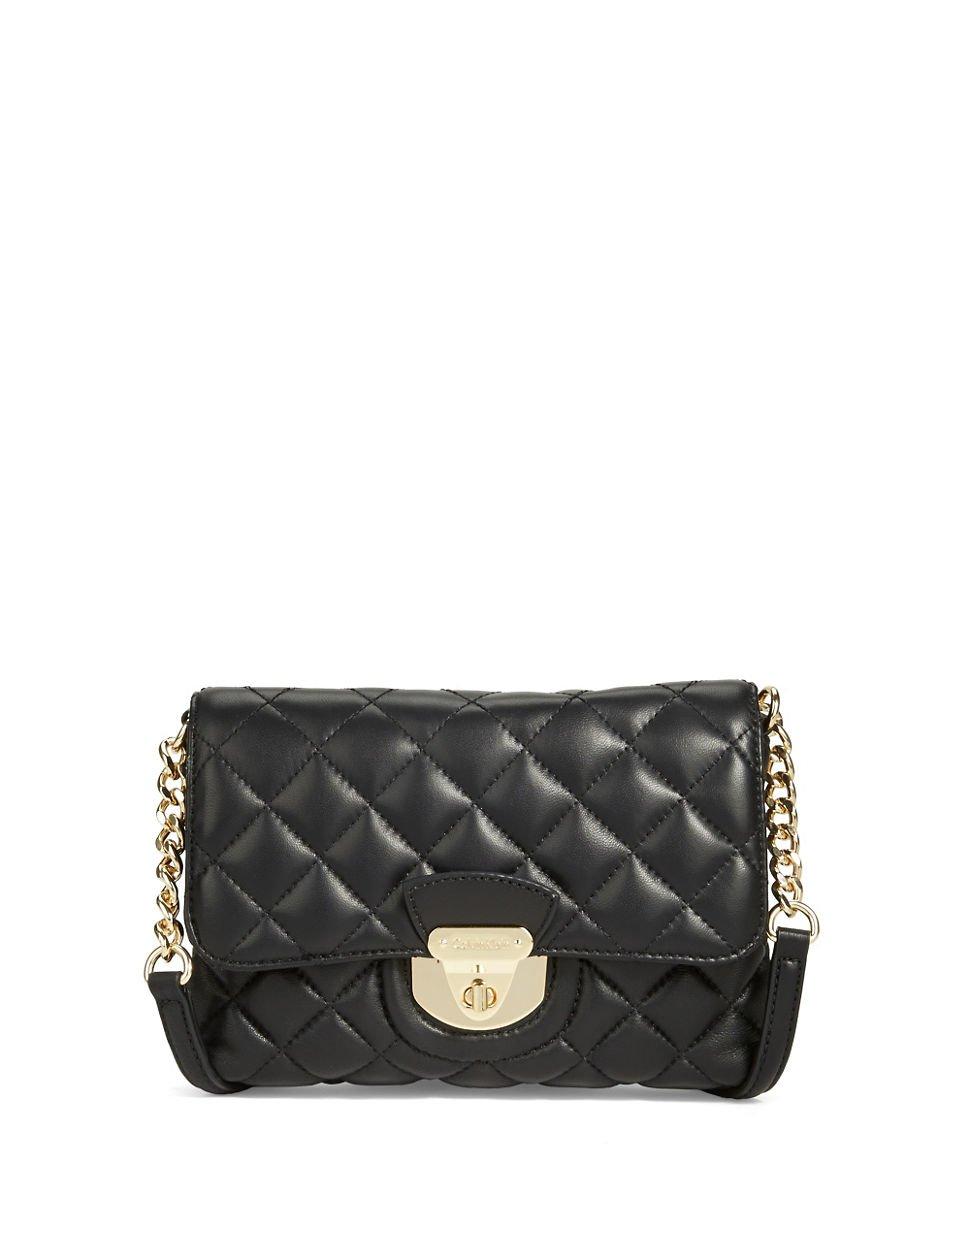 Calvin klein Quilted Crossbody Bag in Black | Lyst : quilted crossbody bags - Adamdwight.com